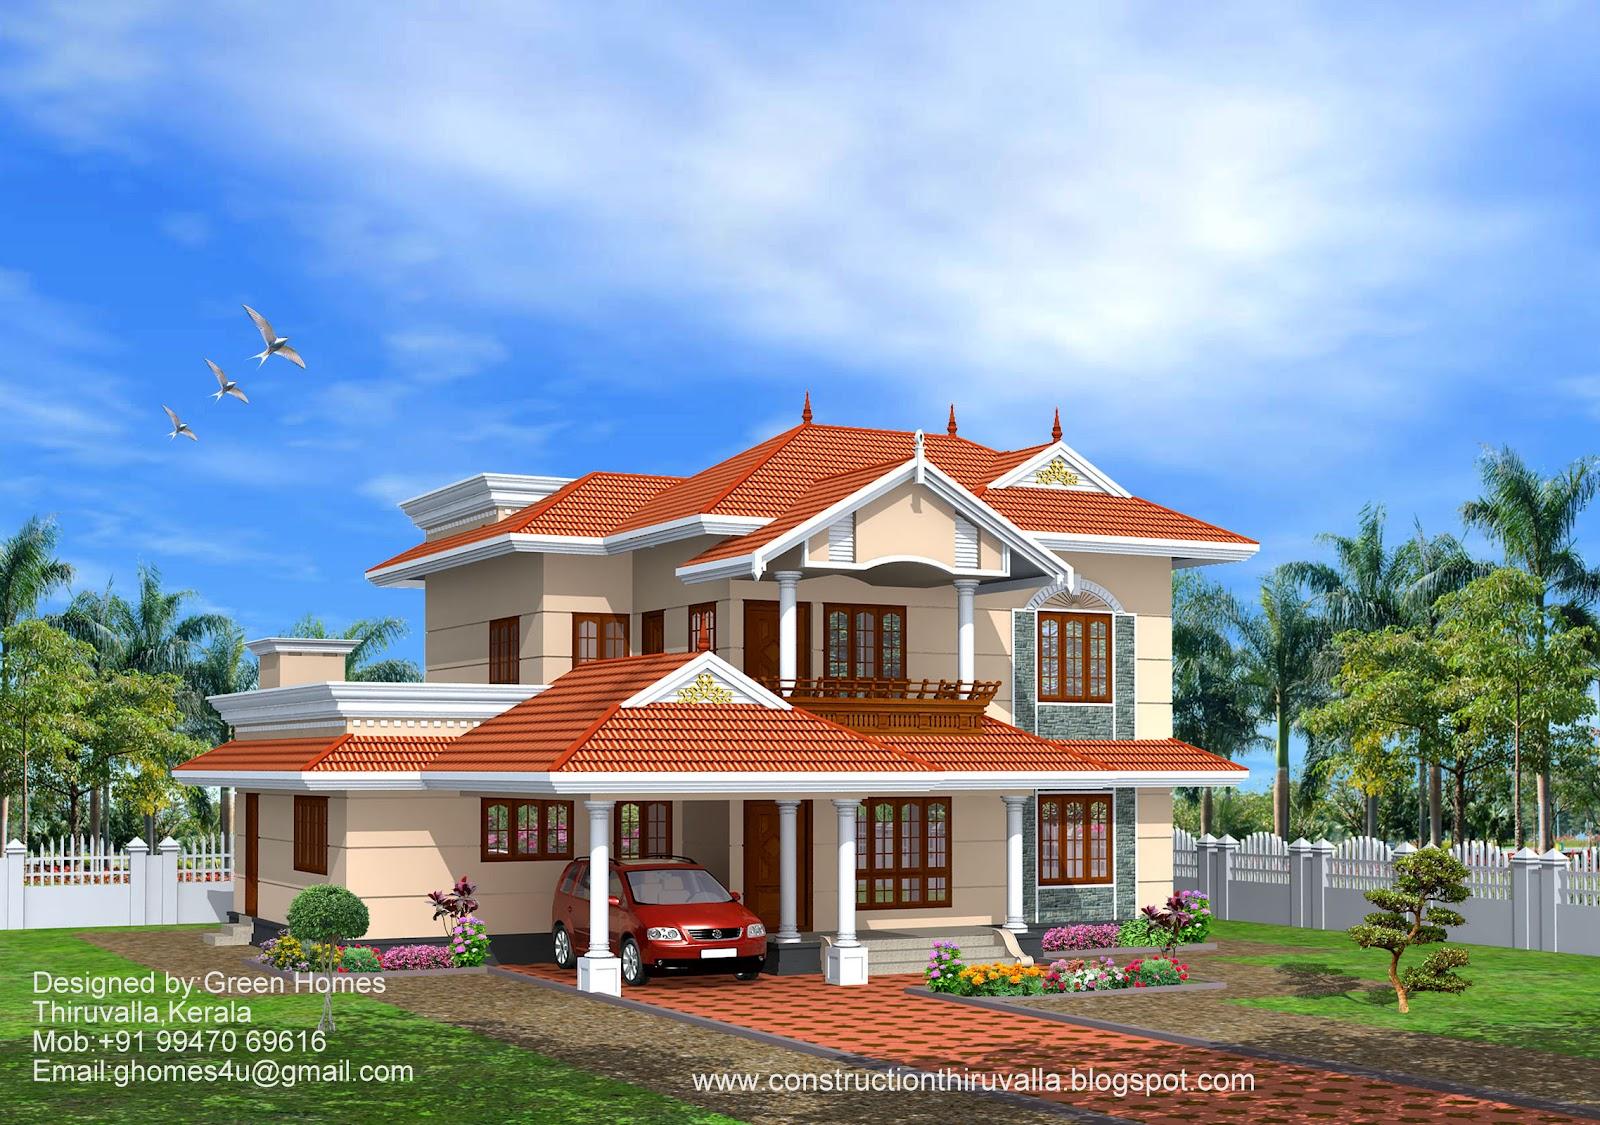 Green Homes Beautiful Kerala Model Home 2850